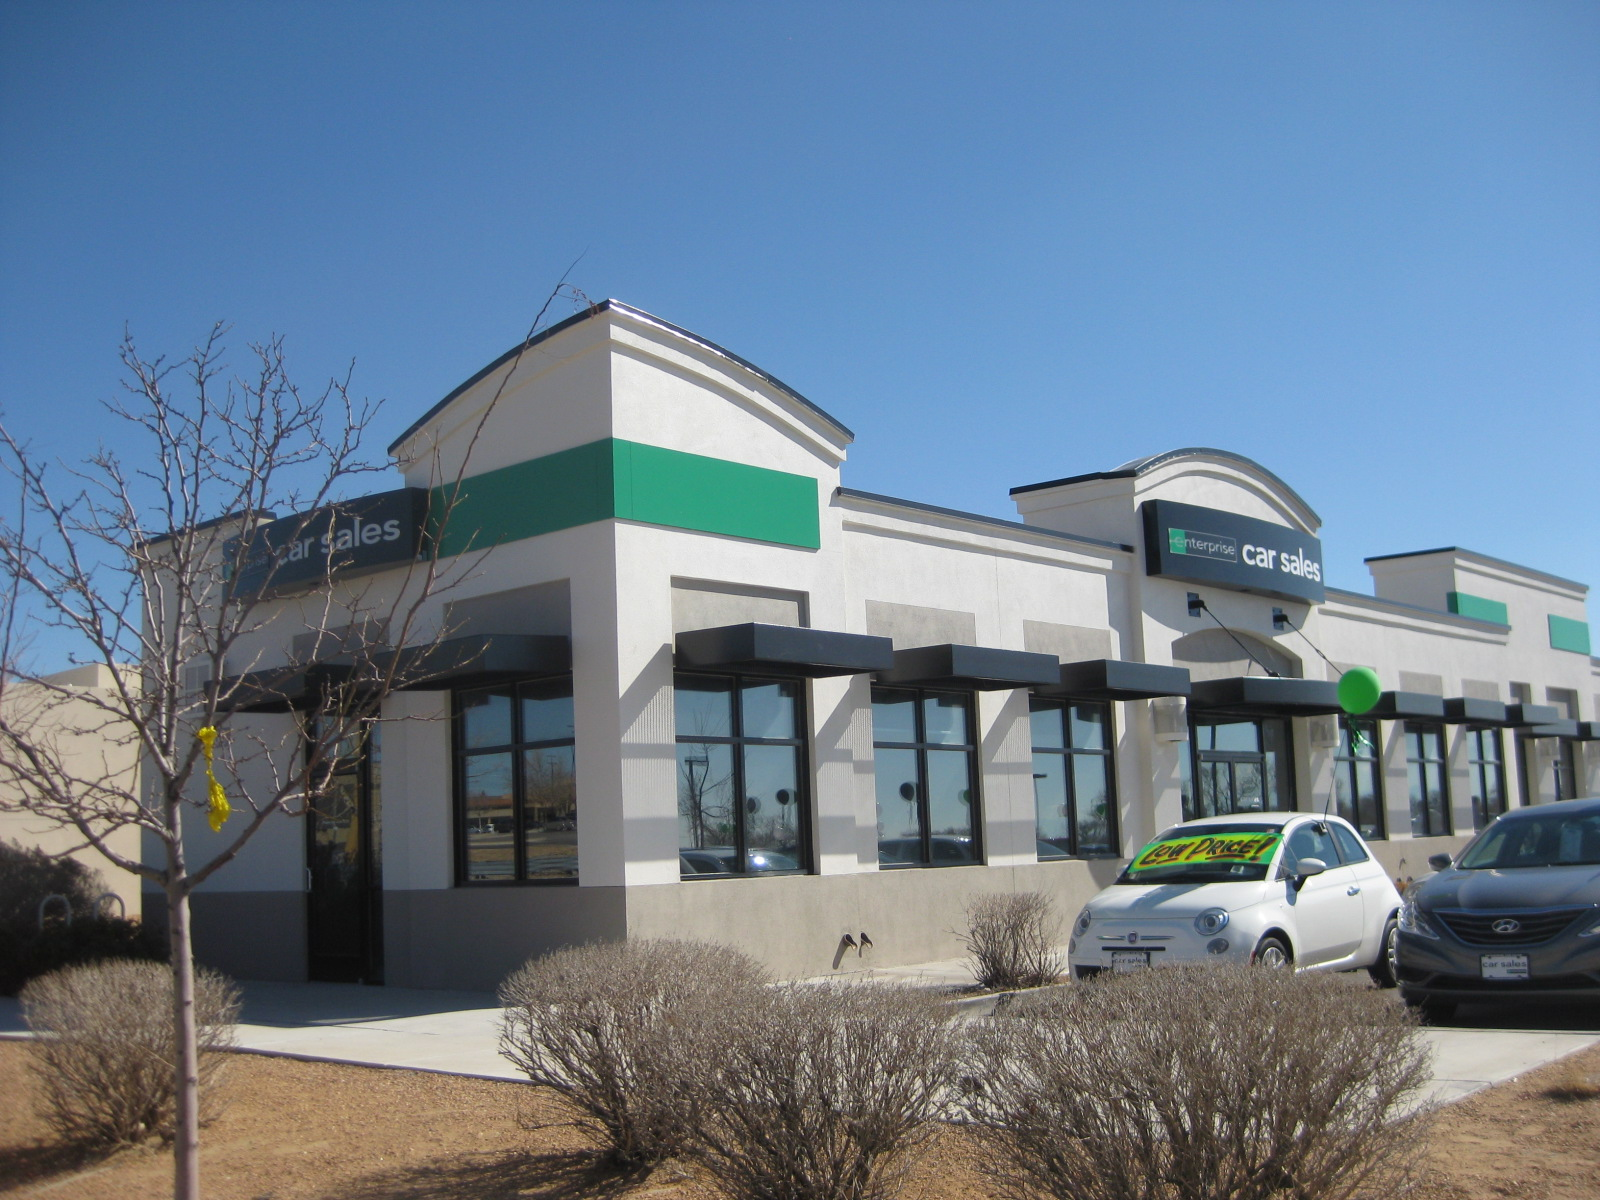 Albuquerque Enterprise (Albuquerque)